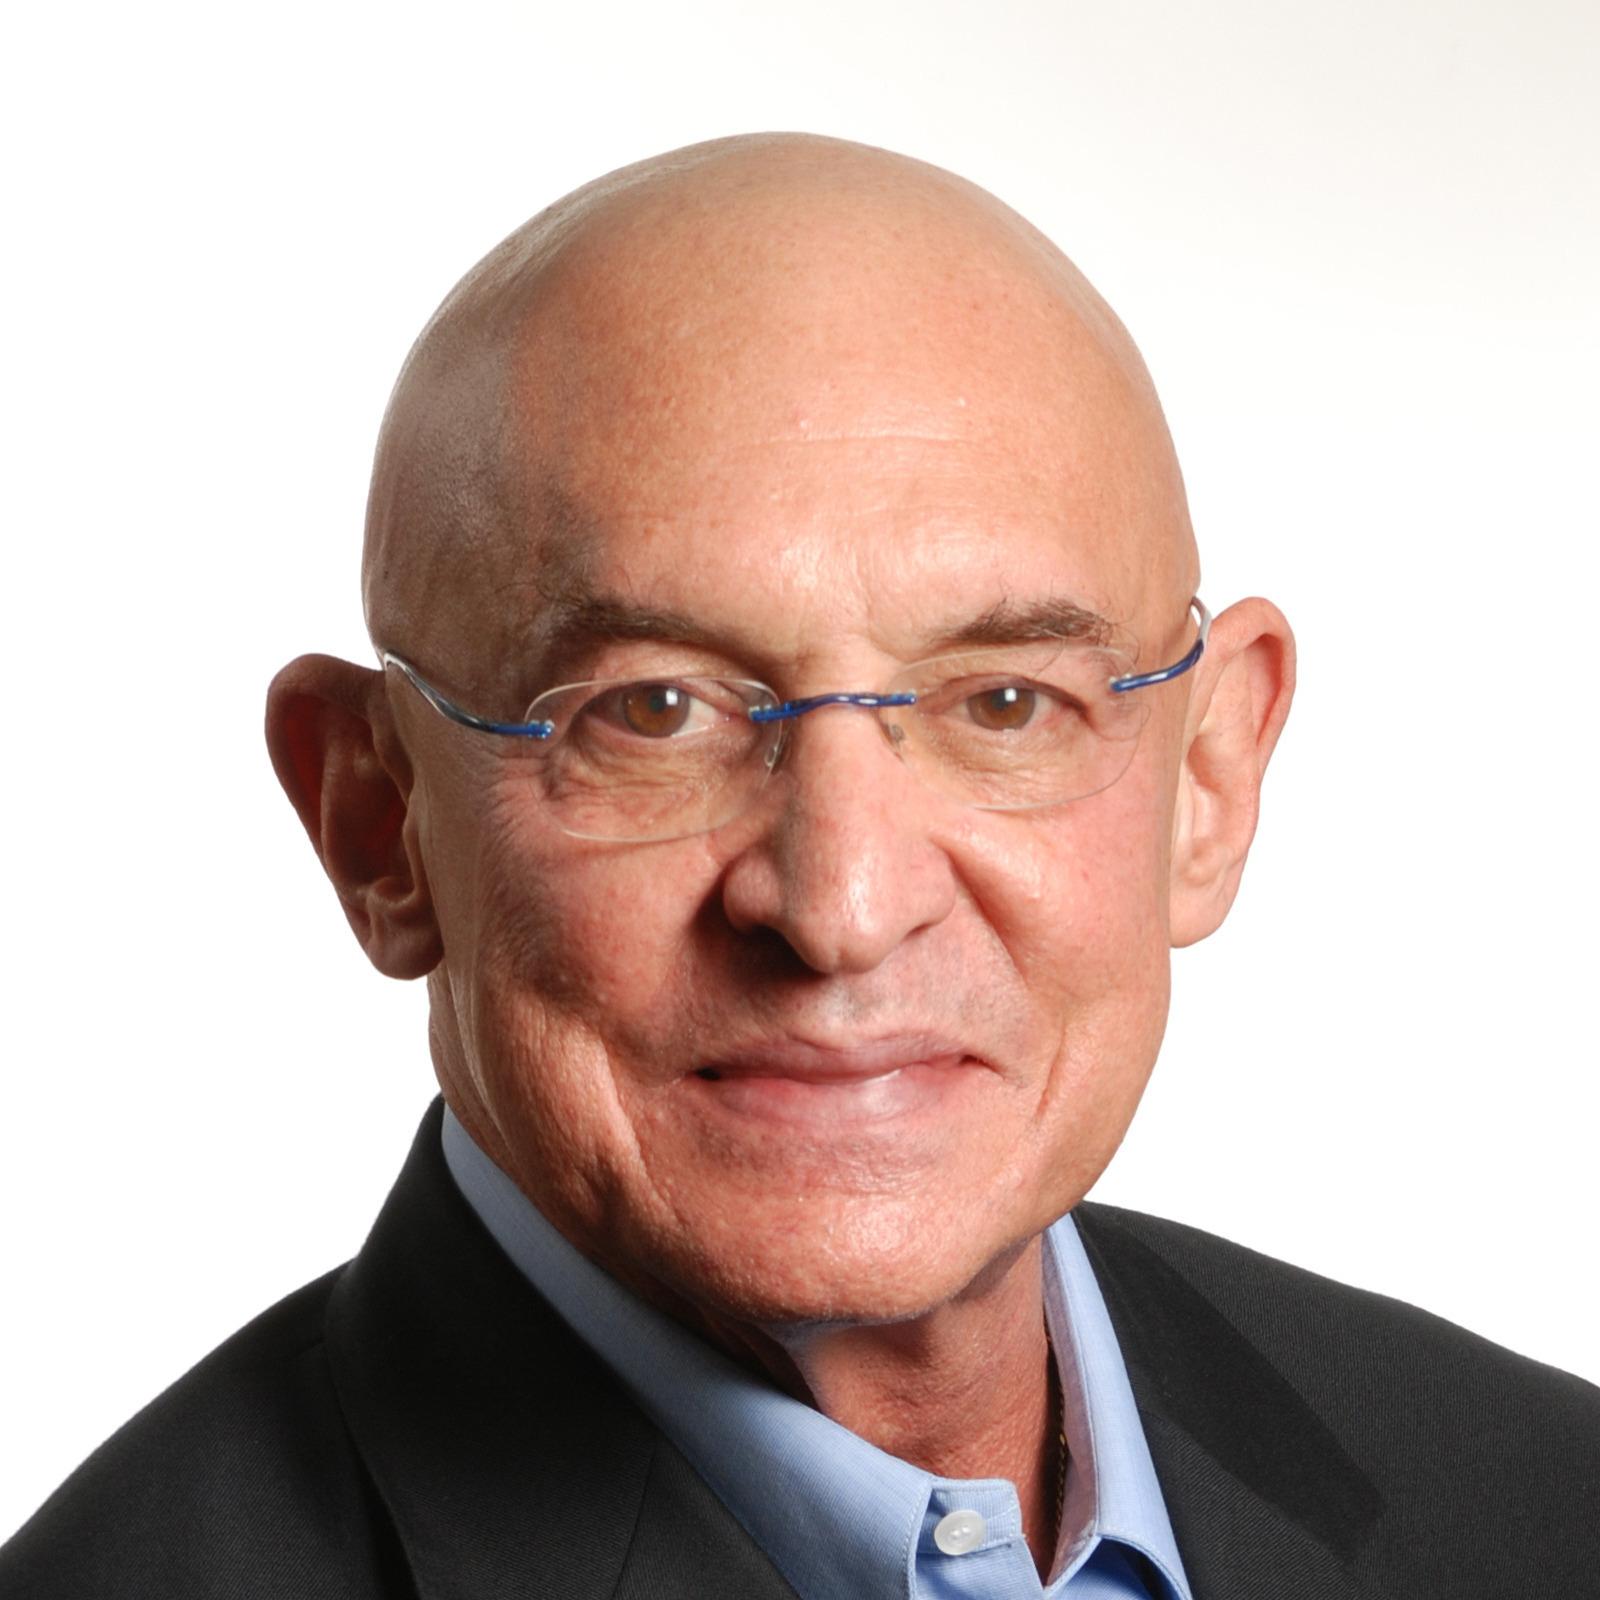 Luis J. Echarte